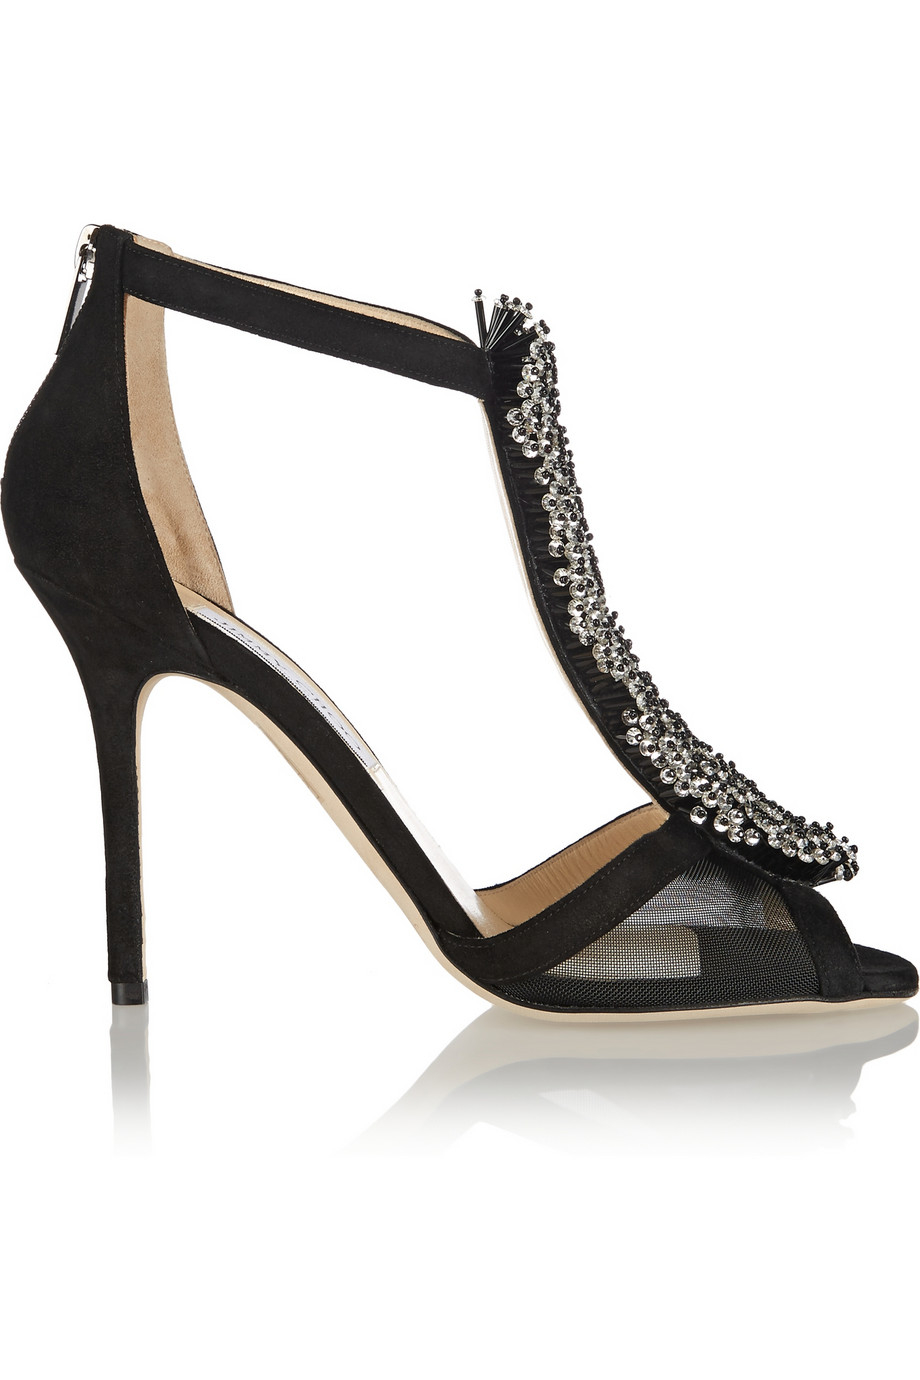 Black mesh sandals - Gallery